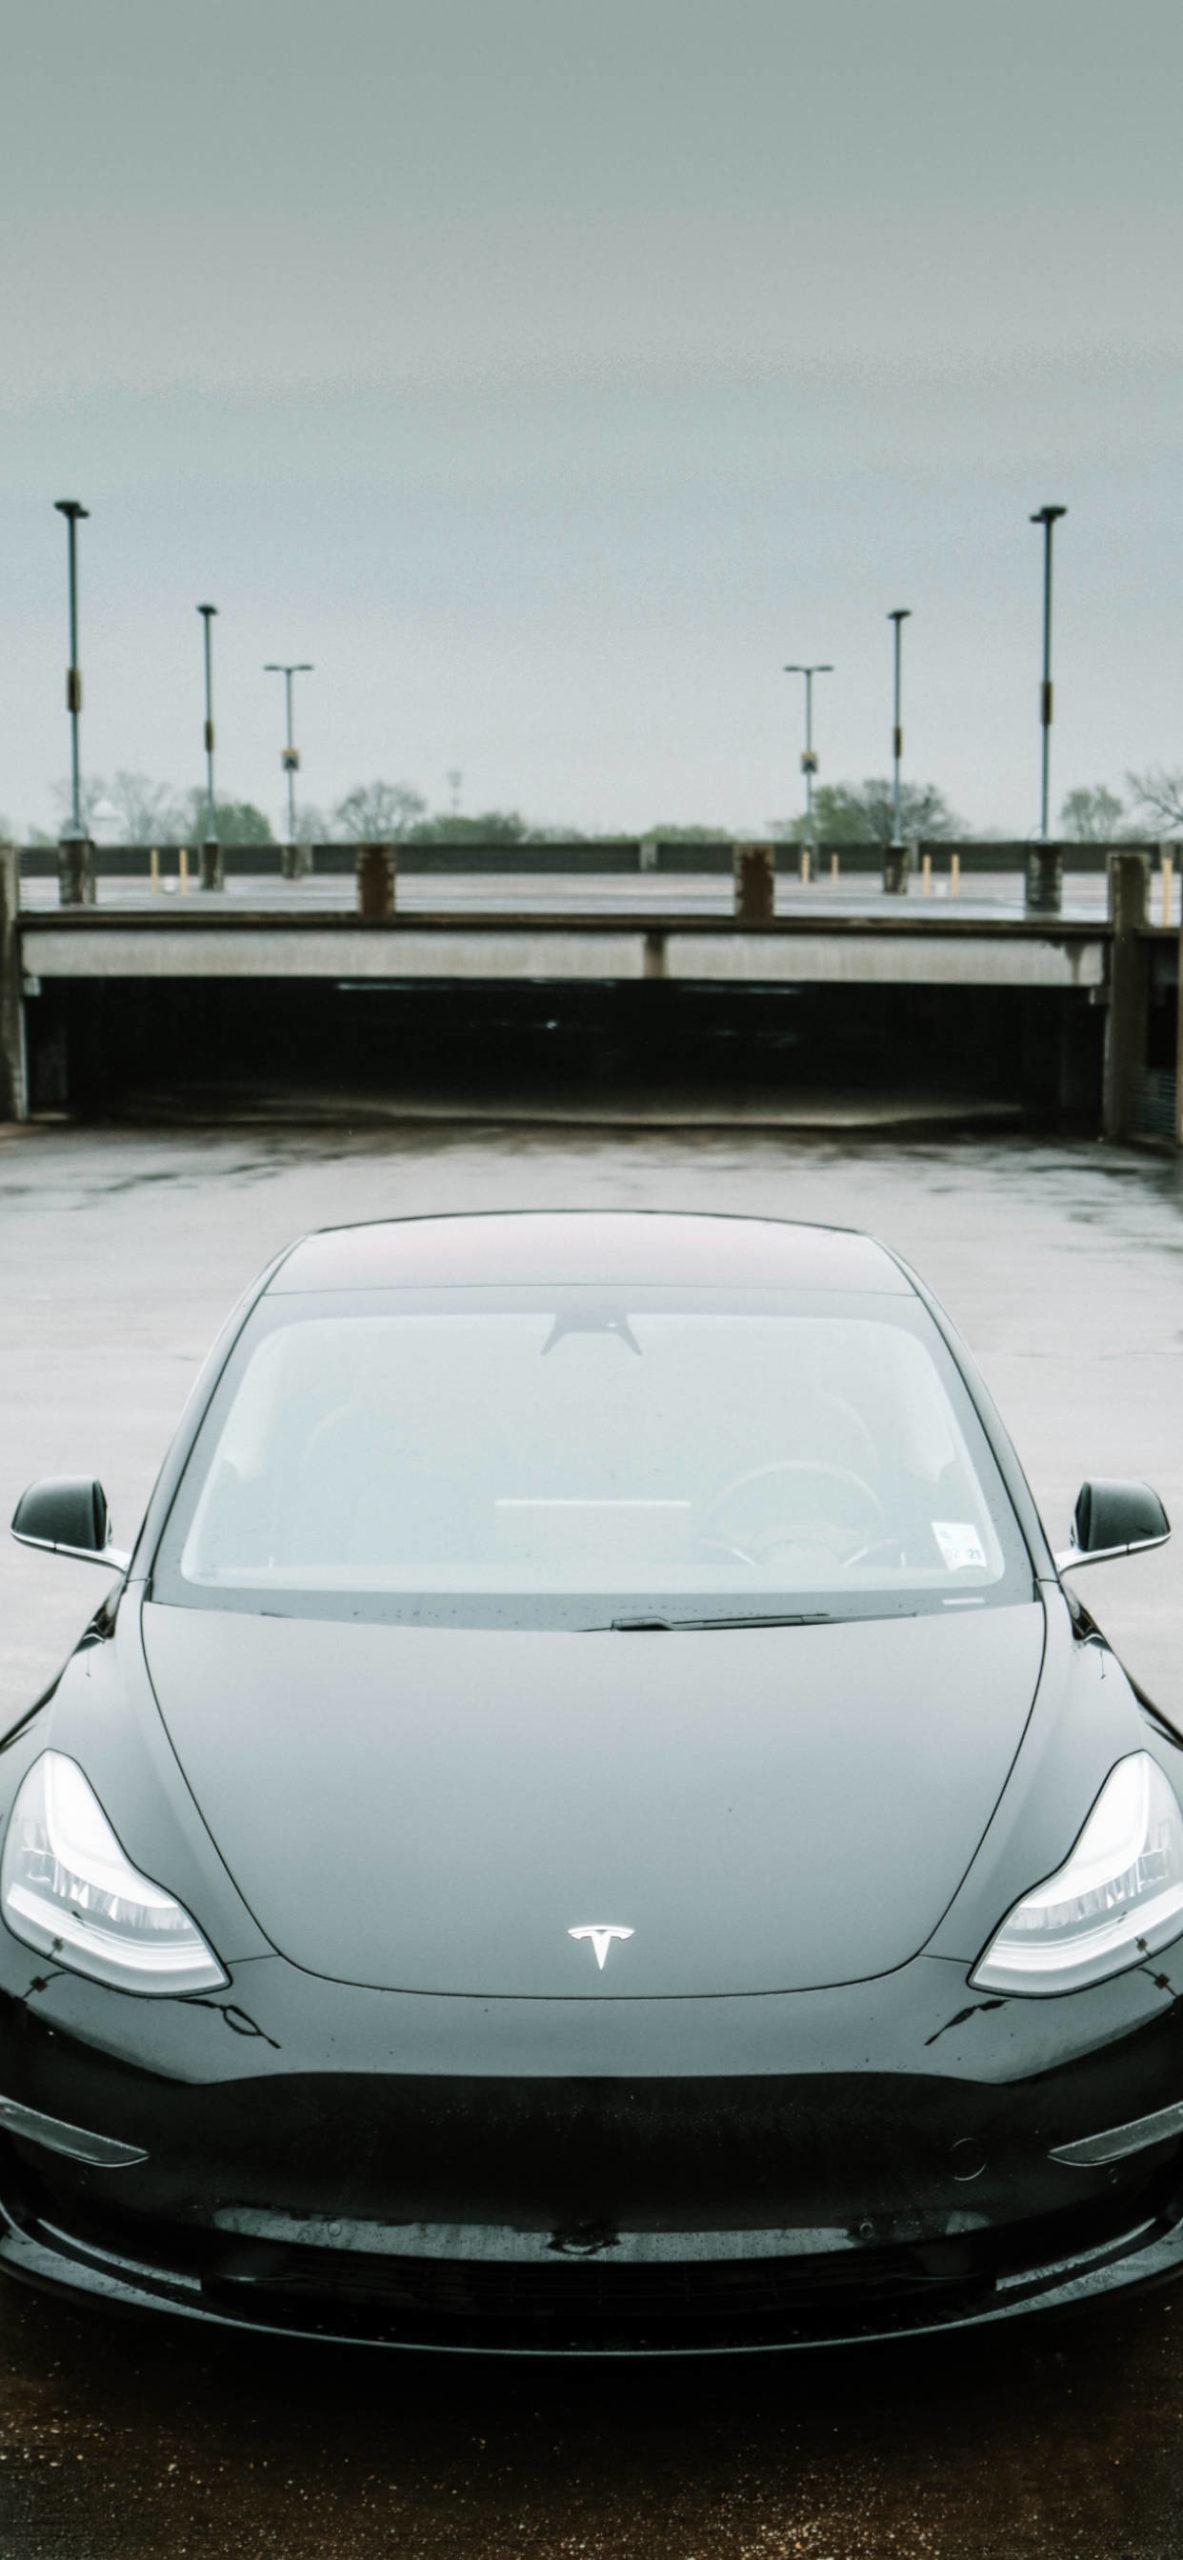 iPhone wallpapers tesla pont scaled Tesla